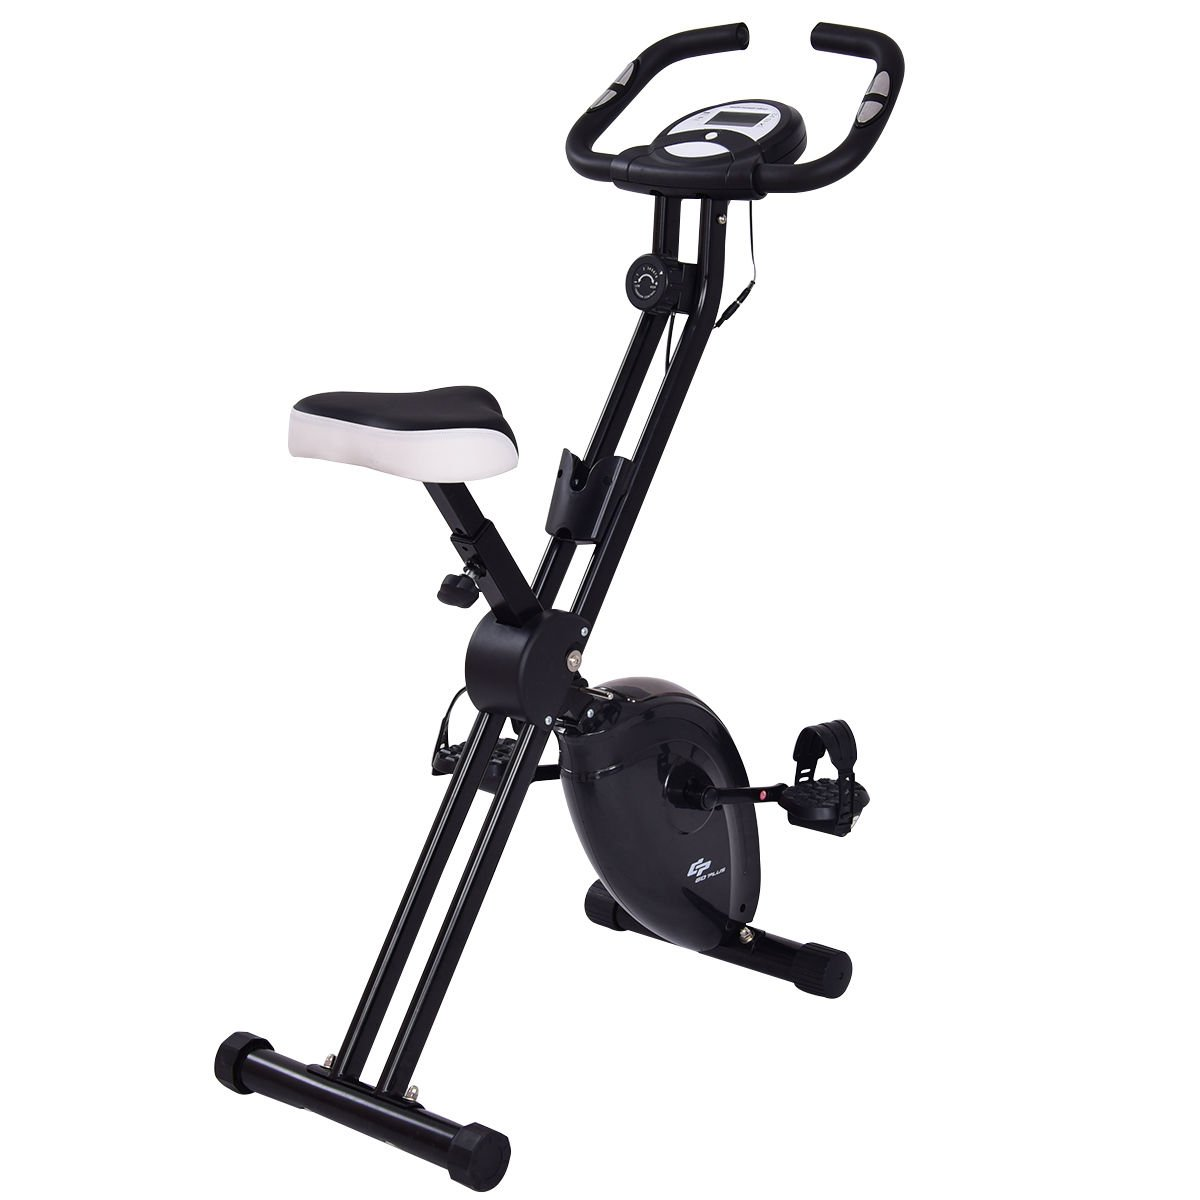 GOPLUS Magnetic Resistance Upright Bike Flywheel Bike Cardio Fitness Bicycle Equipment (Black)